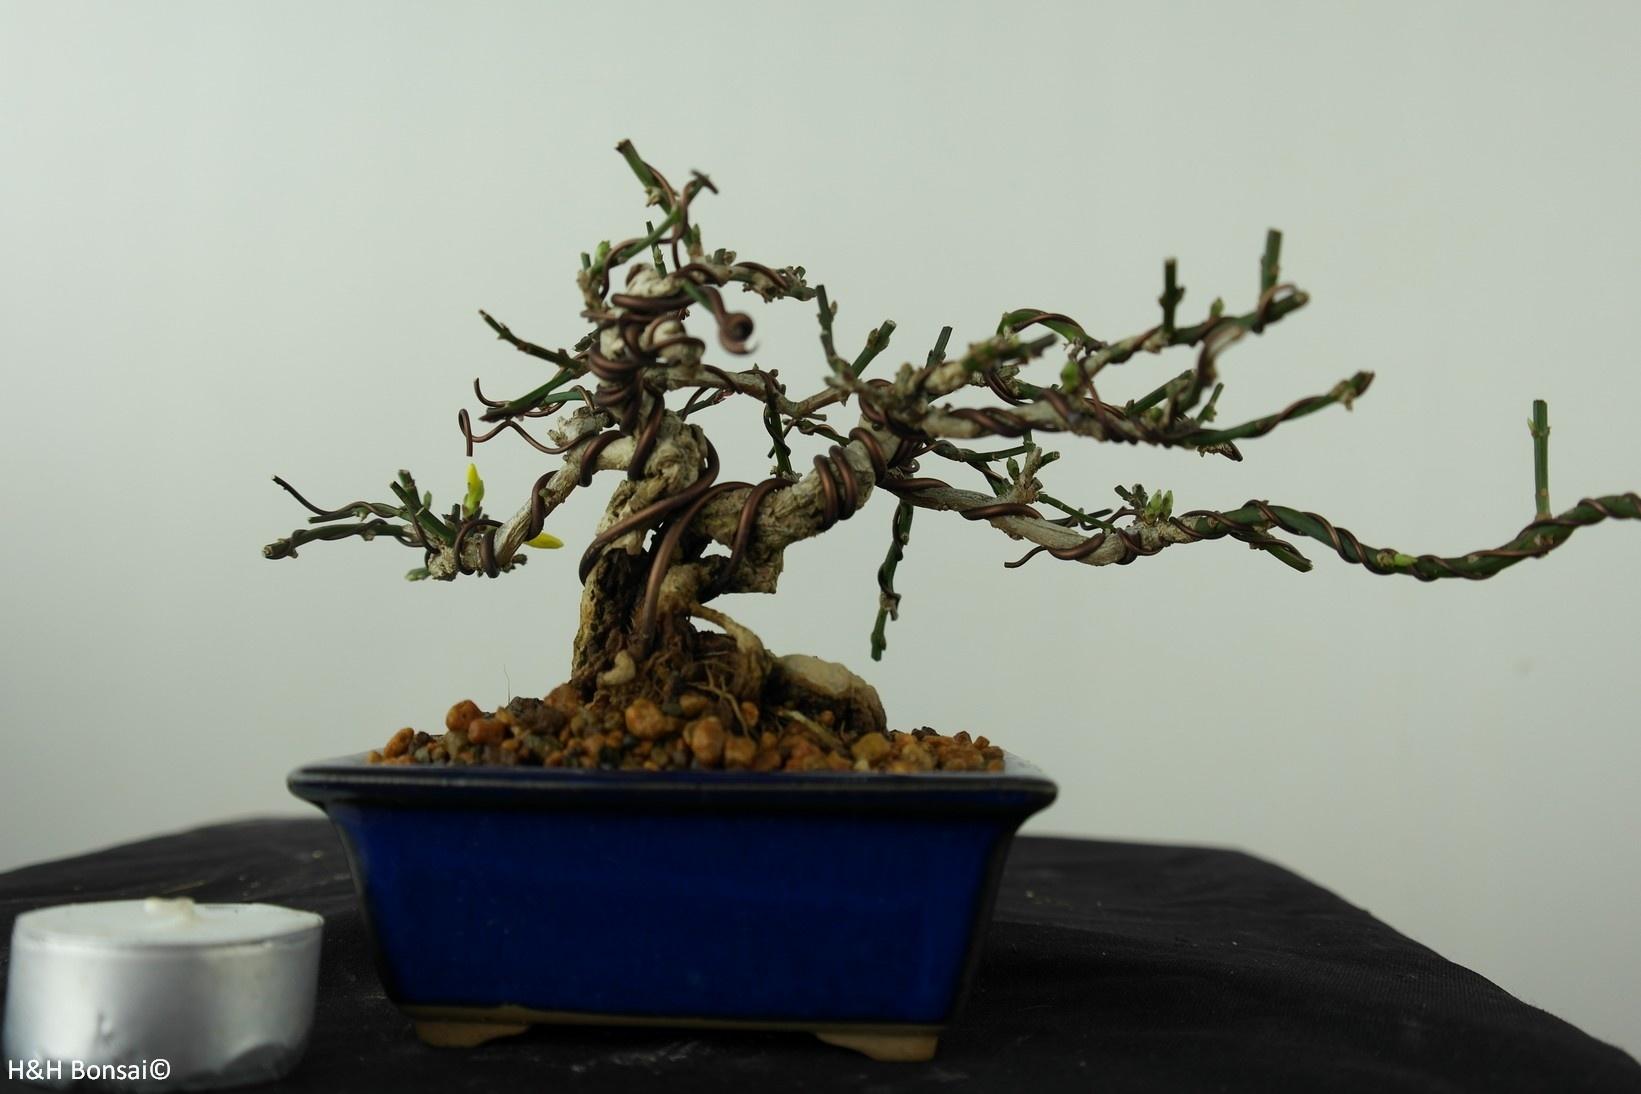 Bonsai ShohinWinter jasmine, Jasminum nudiflorum, no. 7527